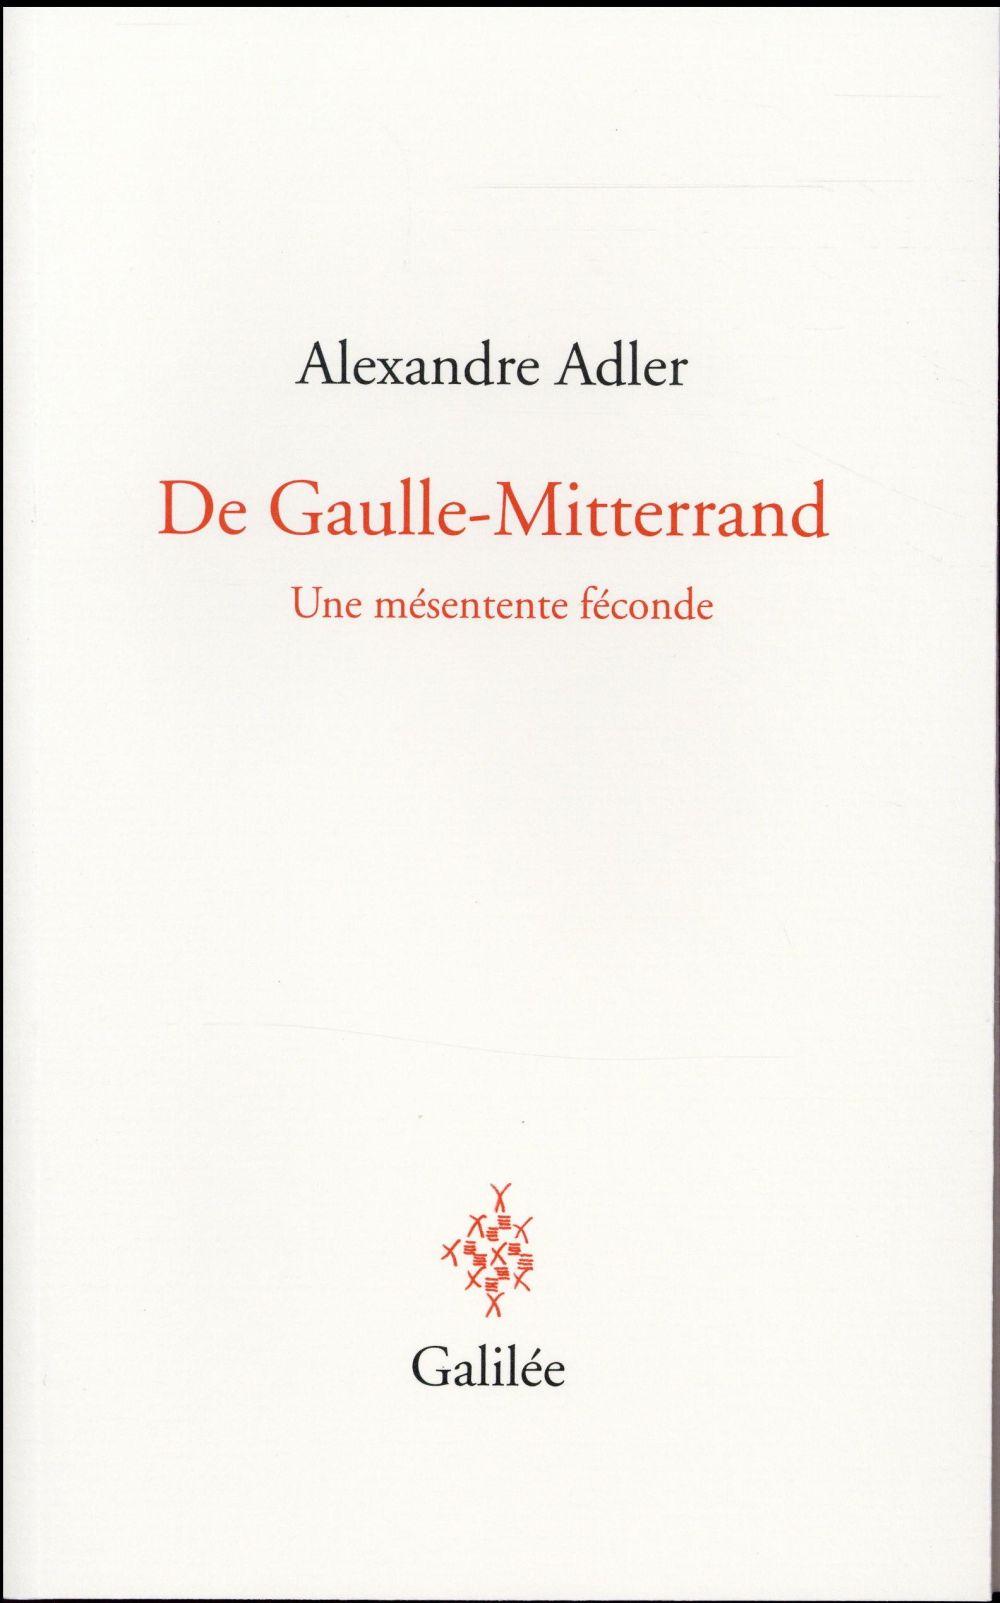 DE GAULLE-MITTERRAND UNE MESENTENTE FECONDE